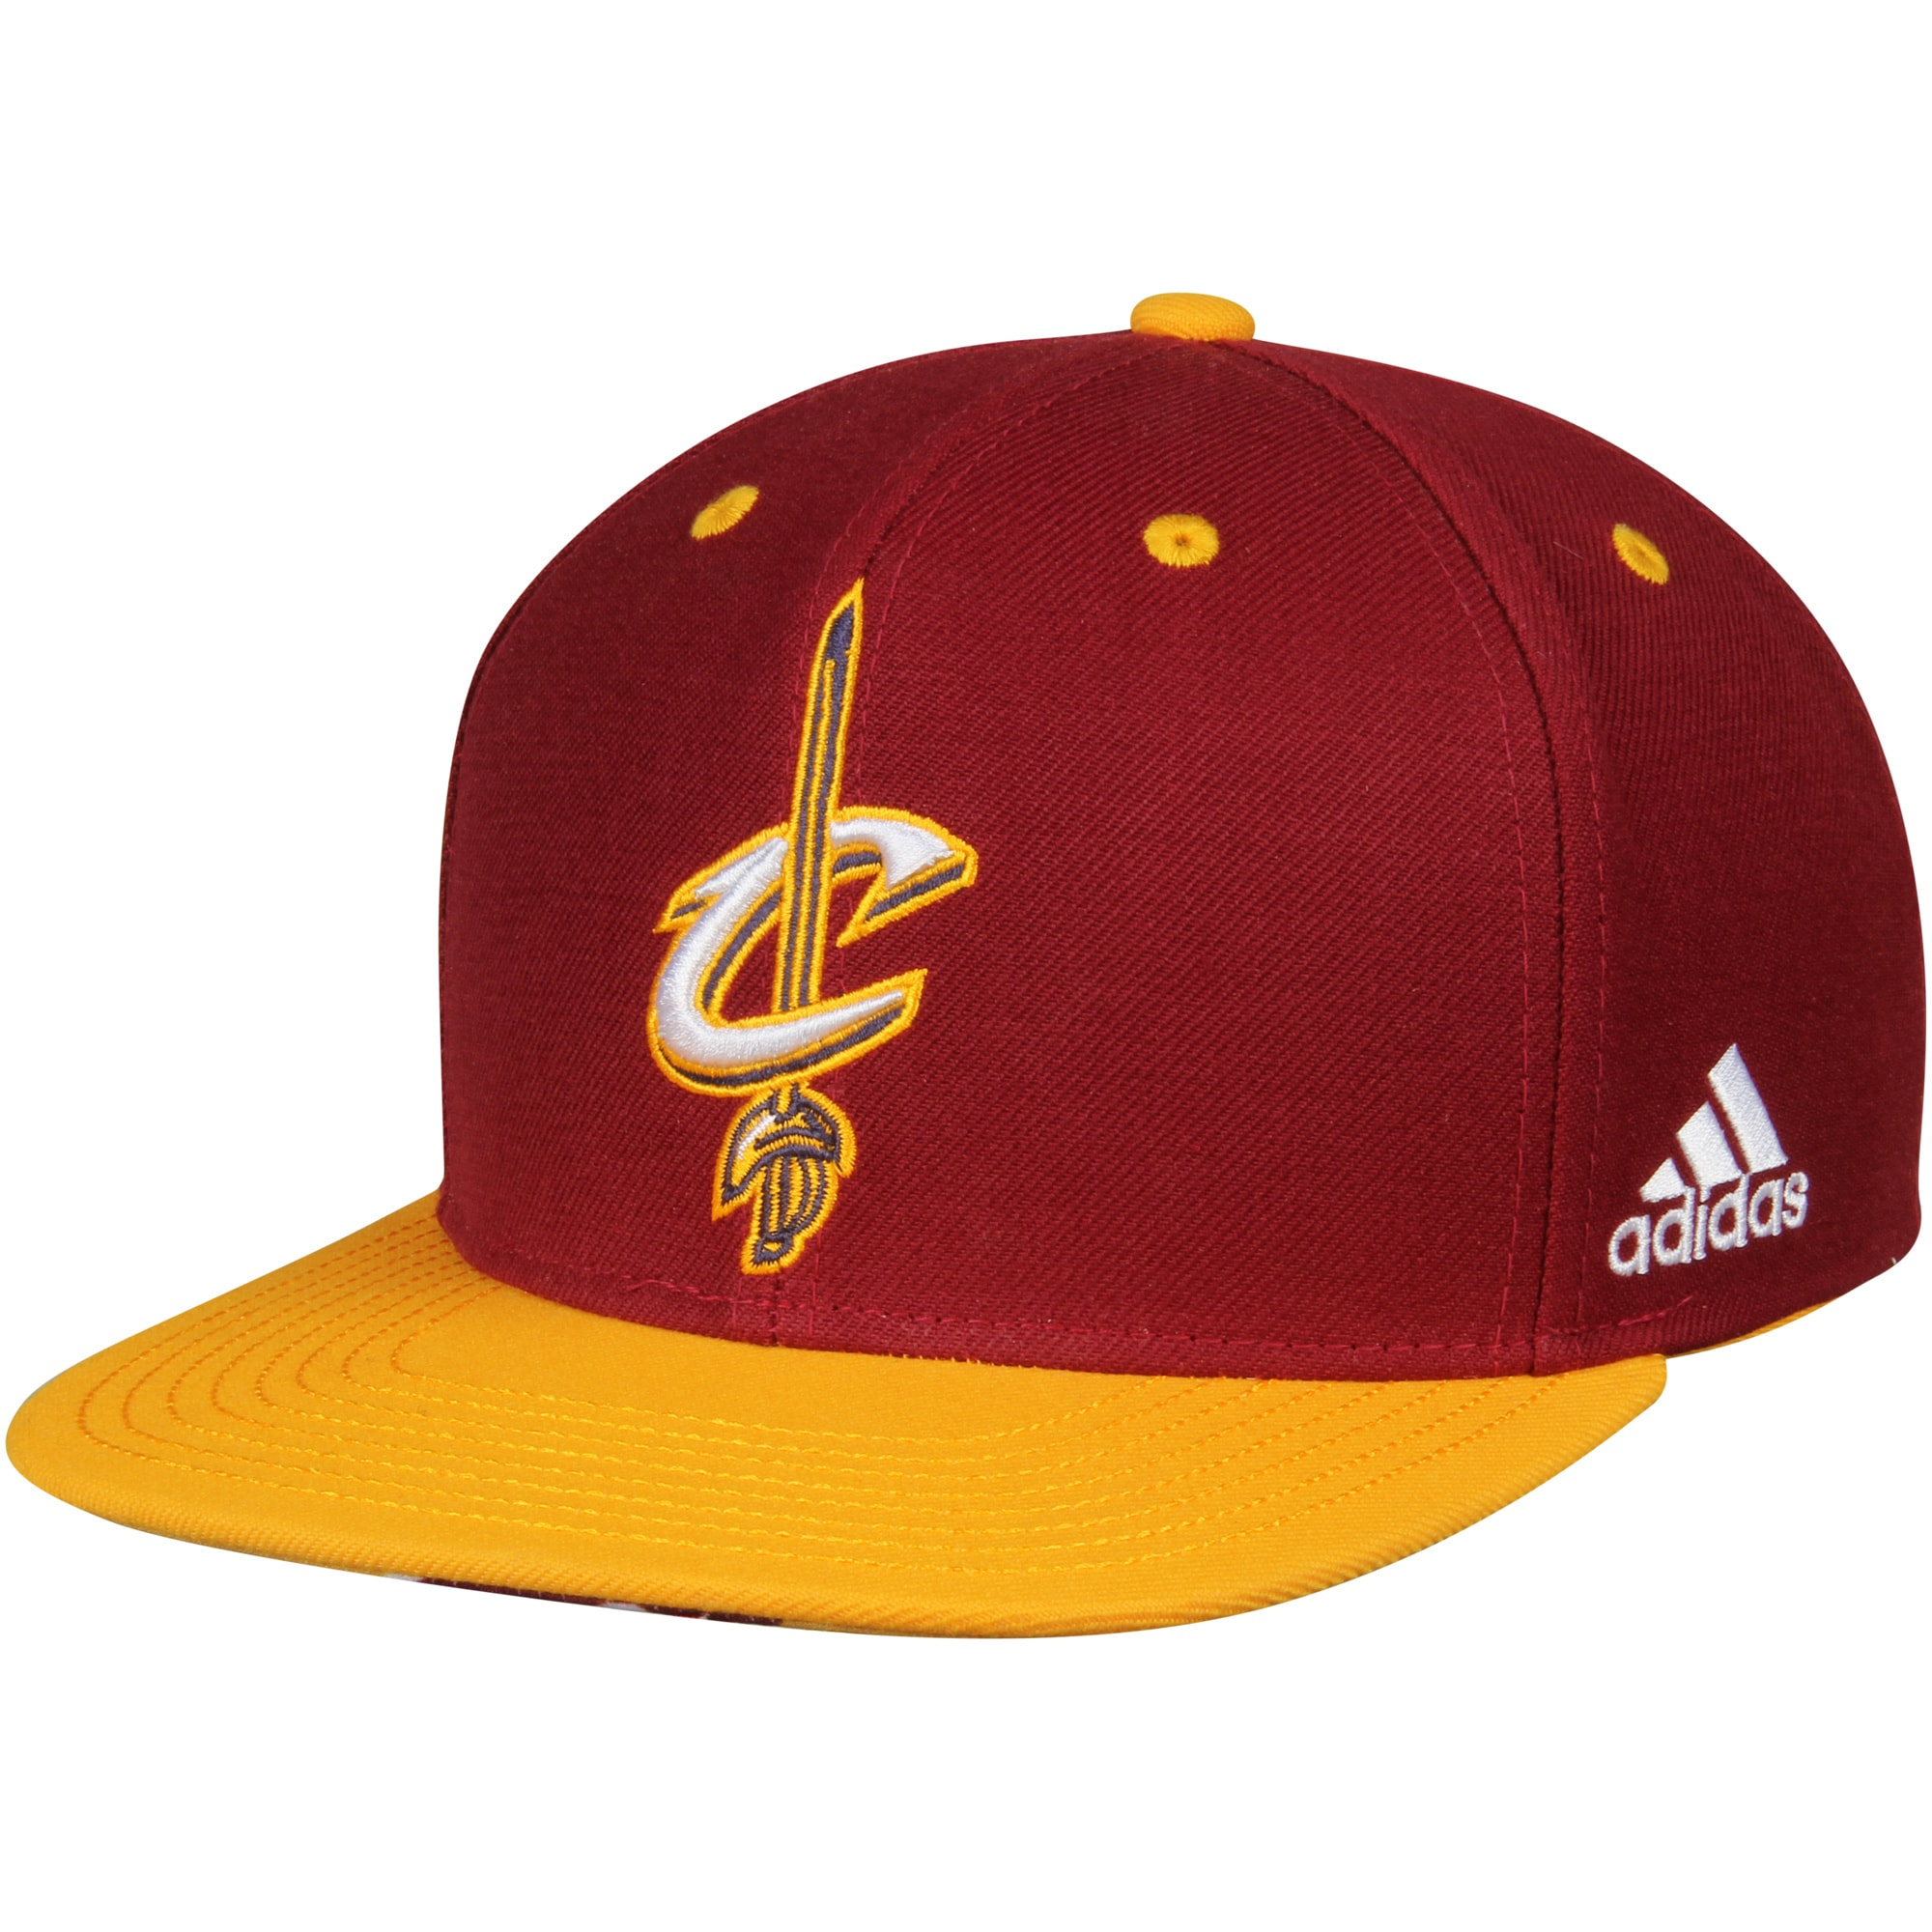 Cleveland Cavaliers adidas On-Court Adjustable Snapback Hat - Wine/Gold